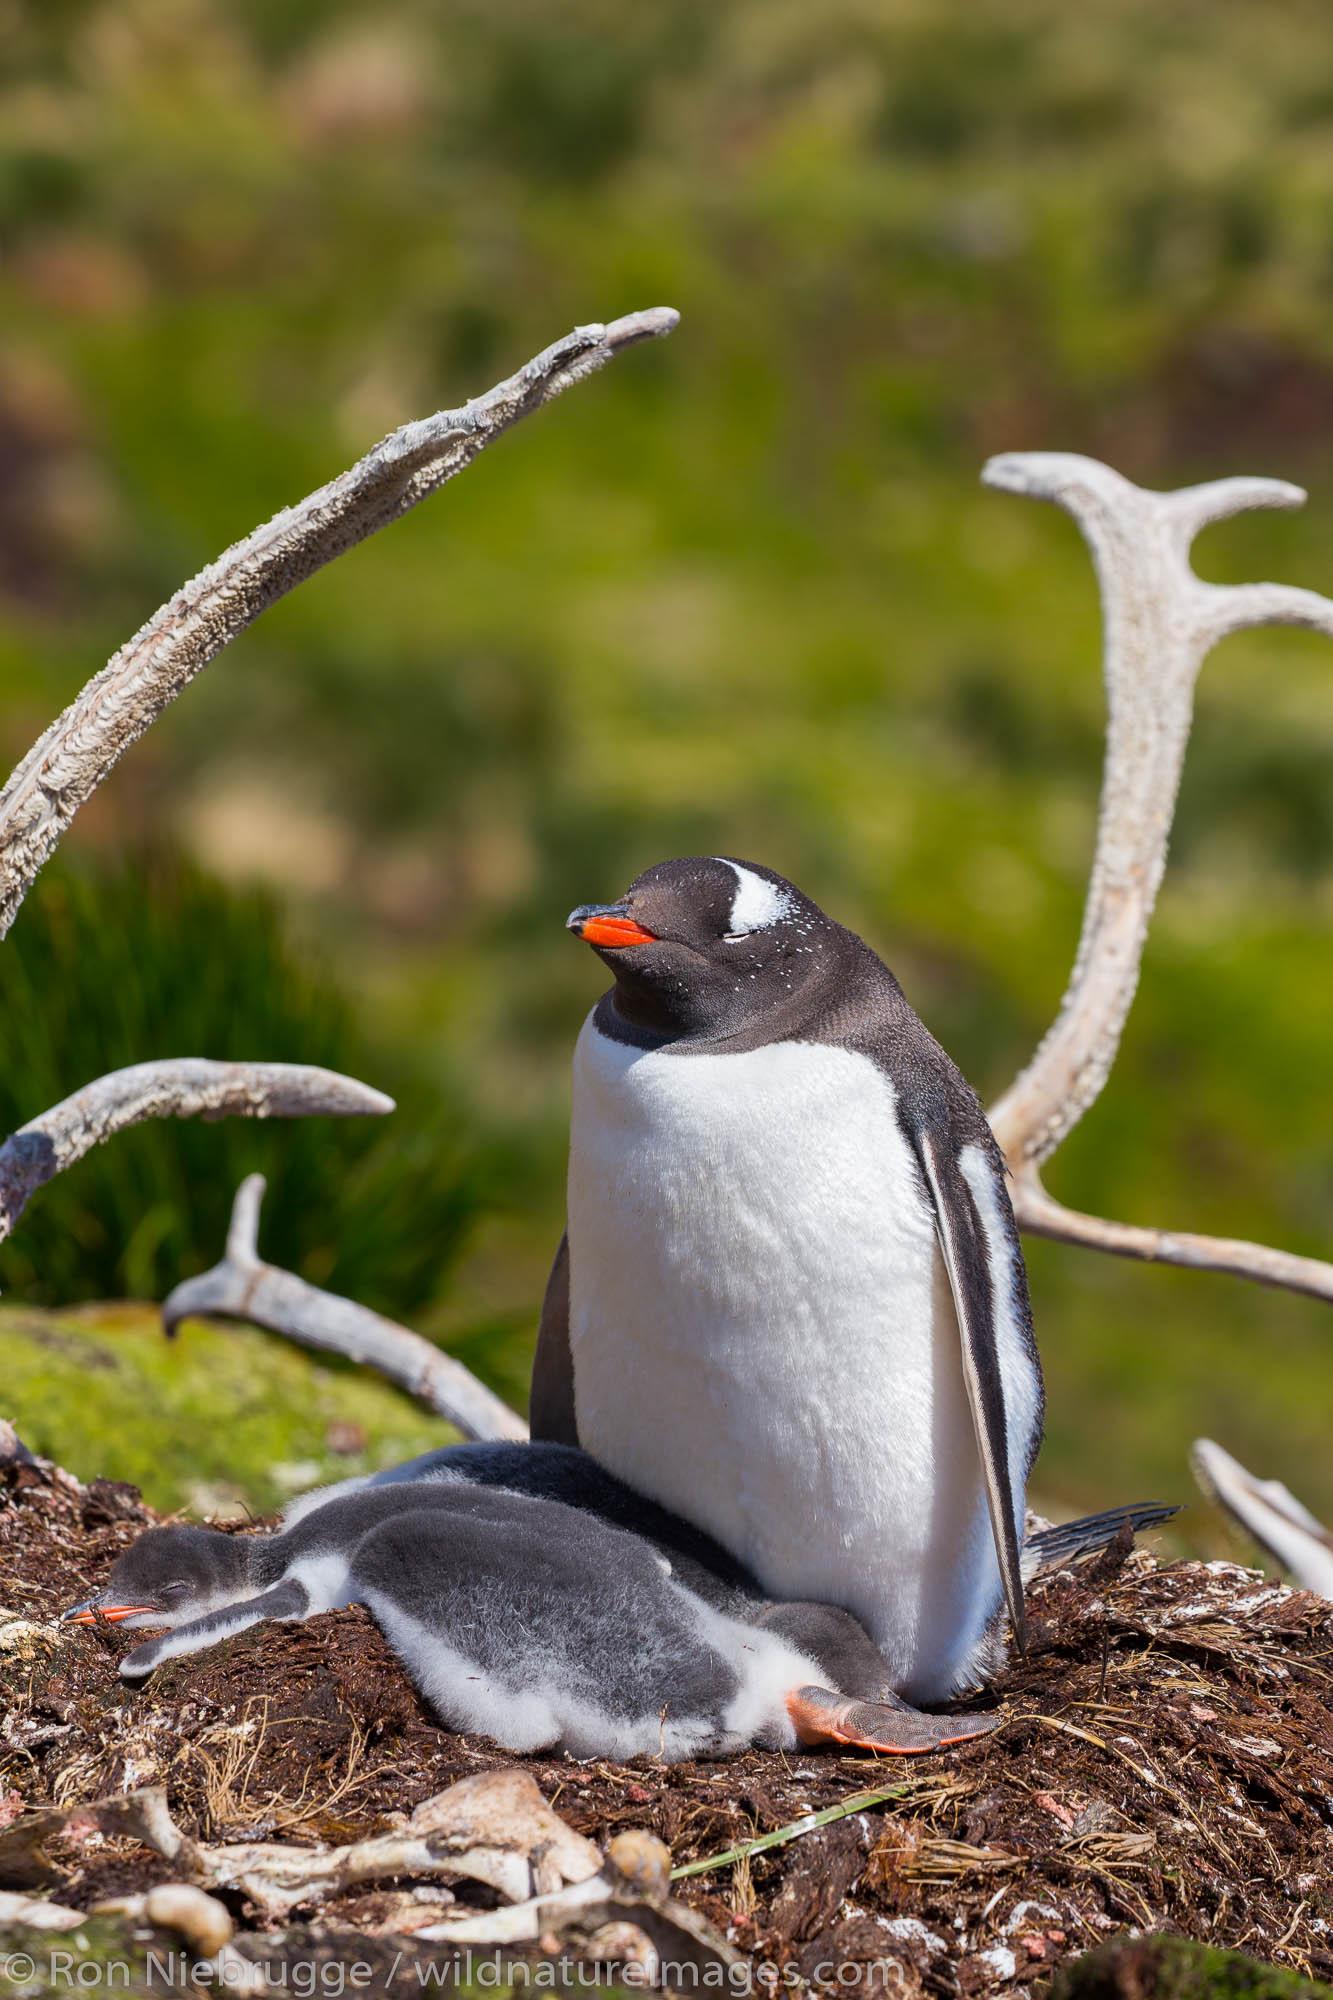 Gentoo penguins and reindeer bones, Godthul Bay, South Georgia, Antarctica.